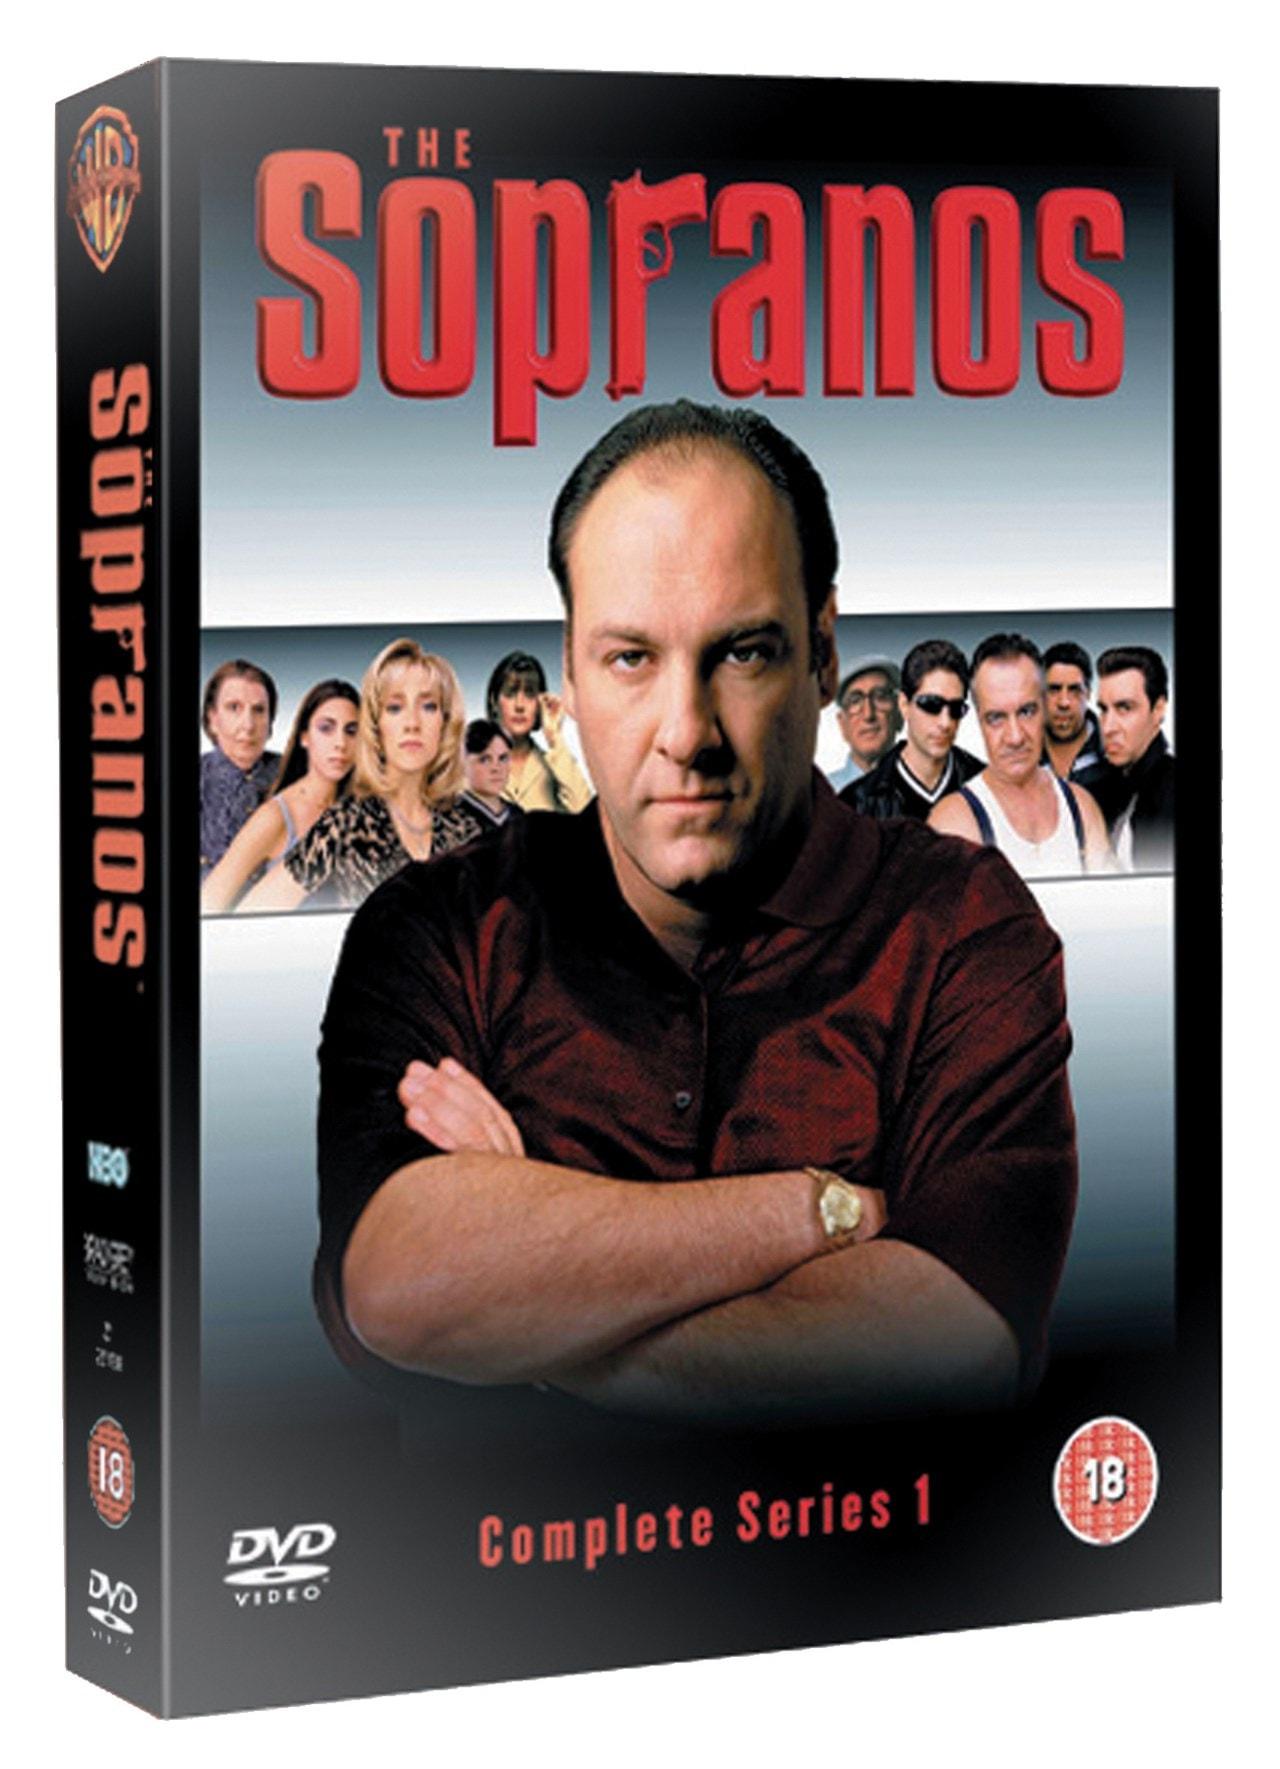 The Sopranos: Complete Series 1 - 2